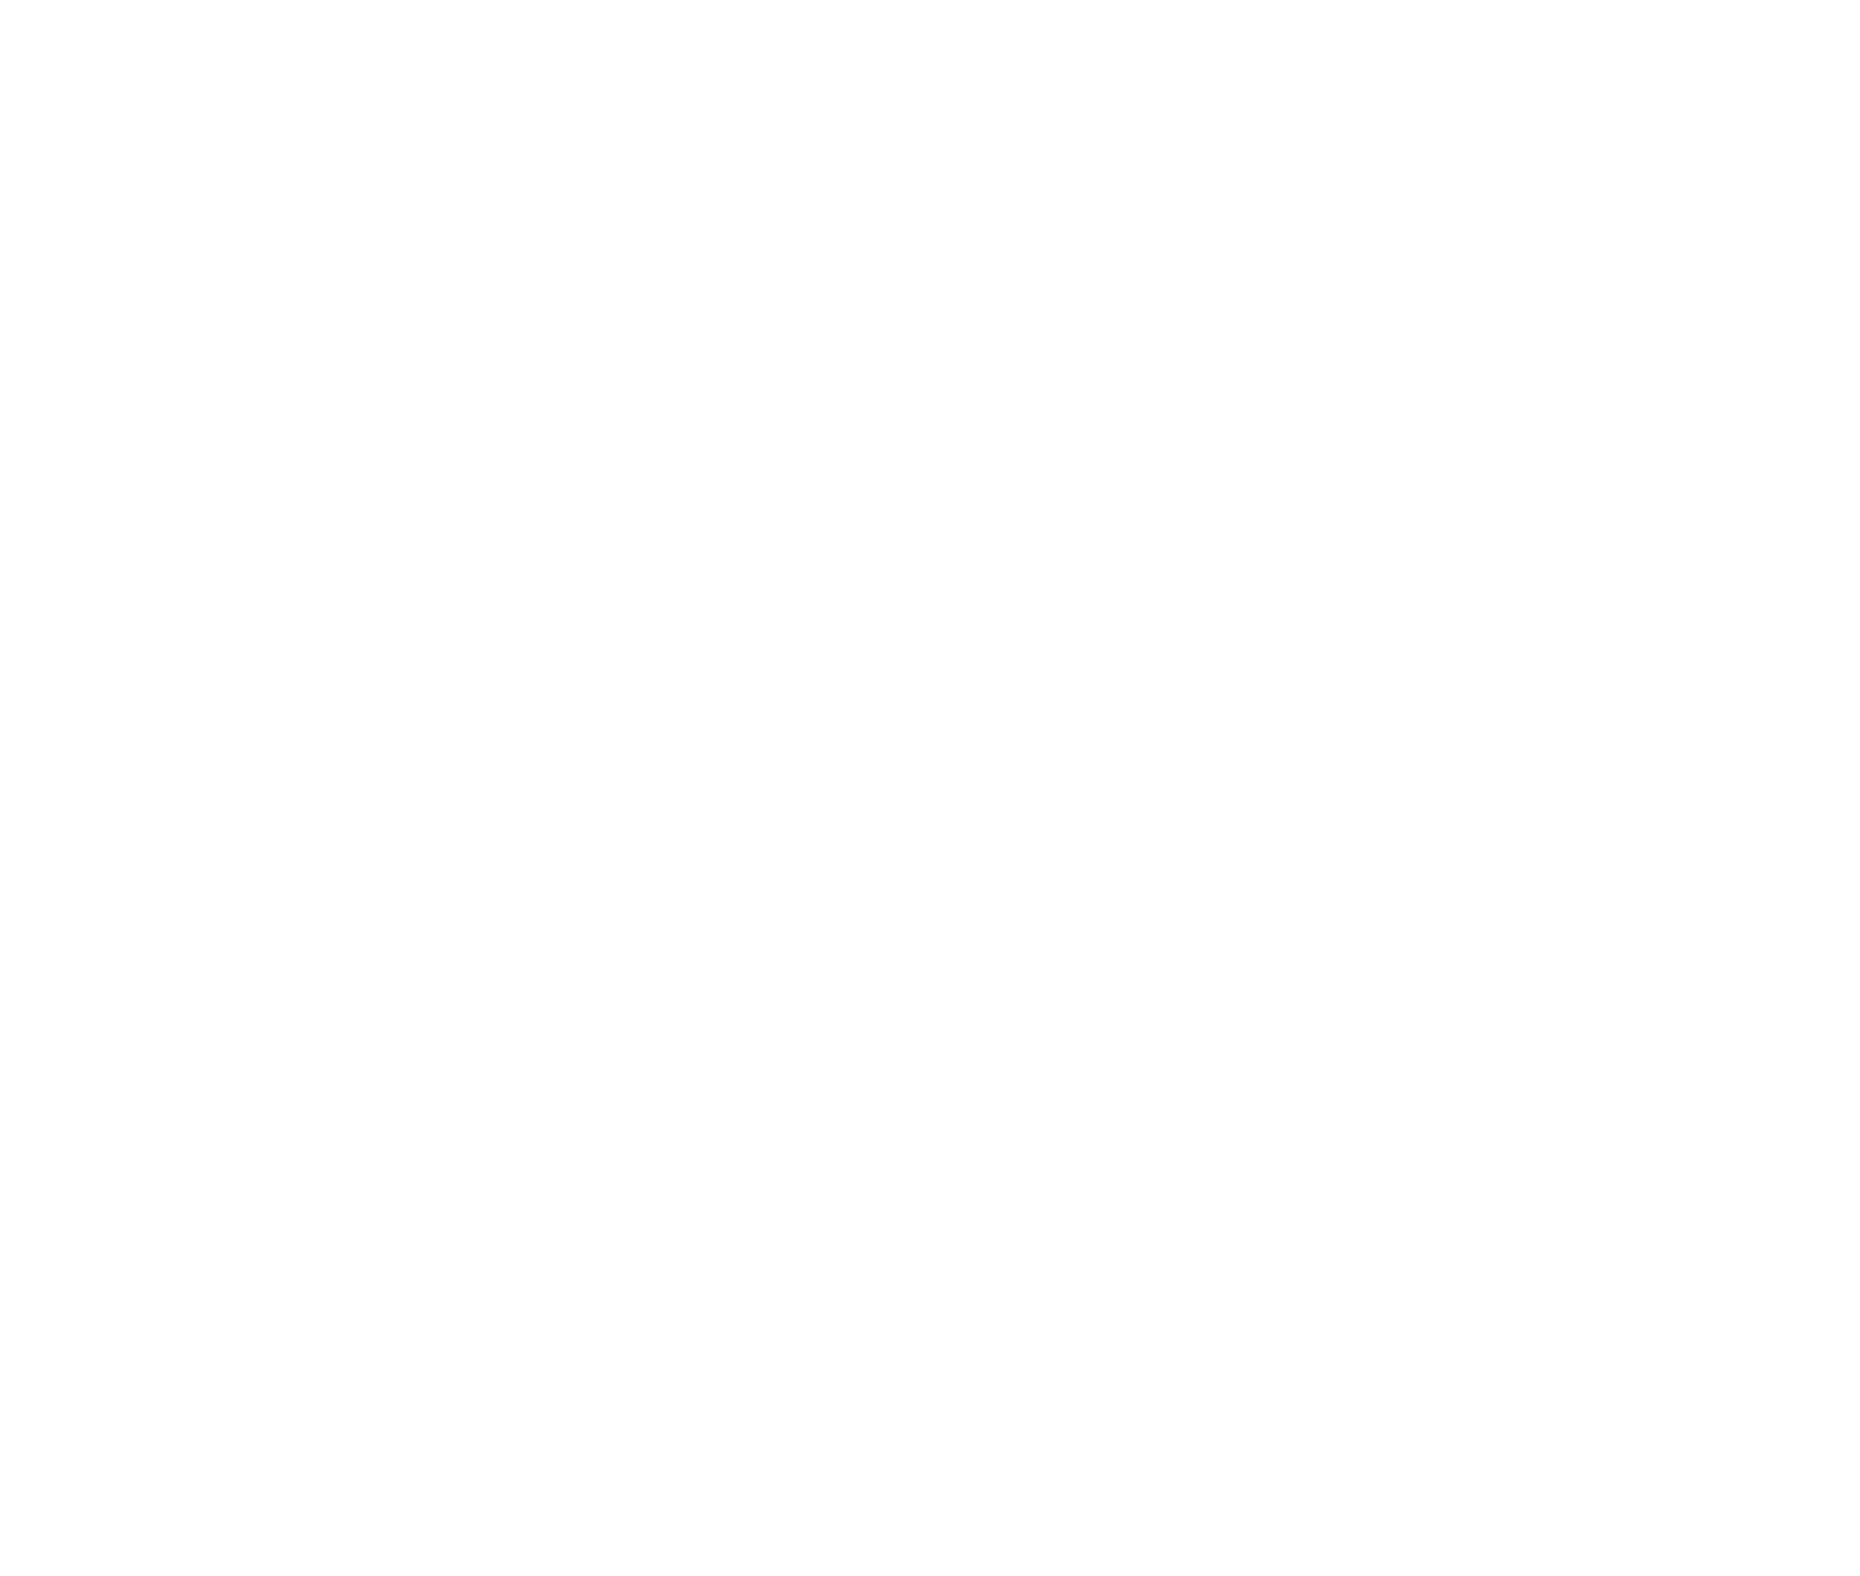 Scuderia | Future Food Urban CooLab